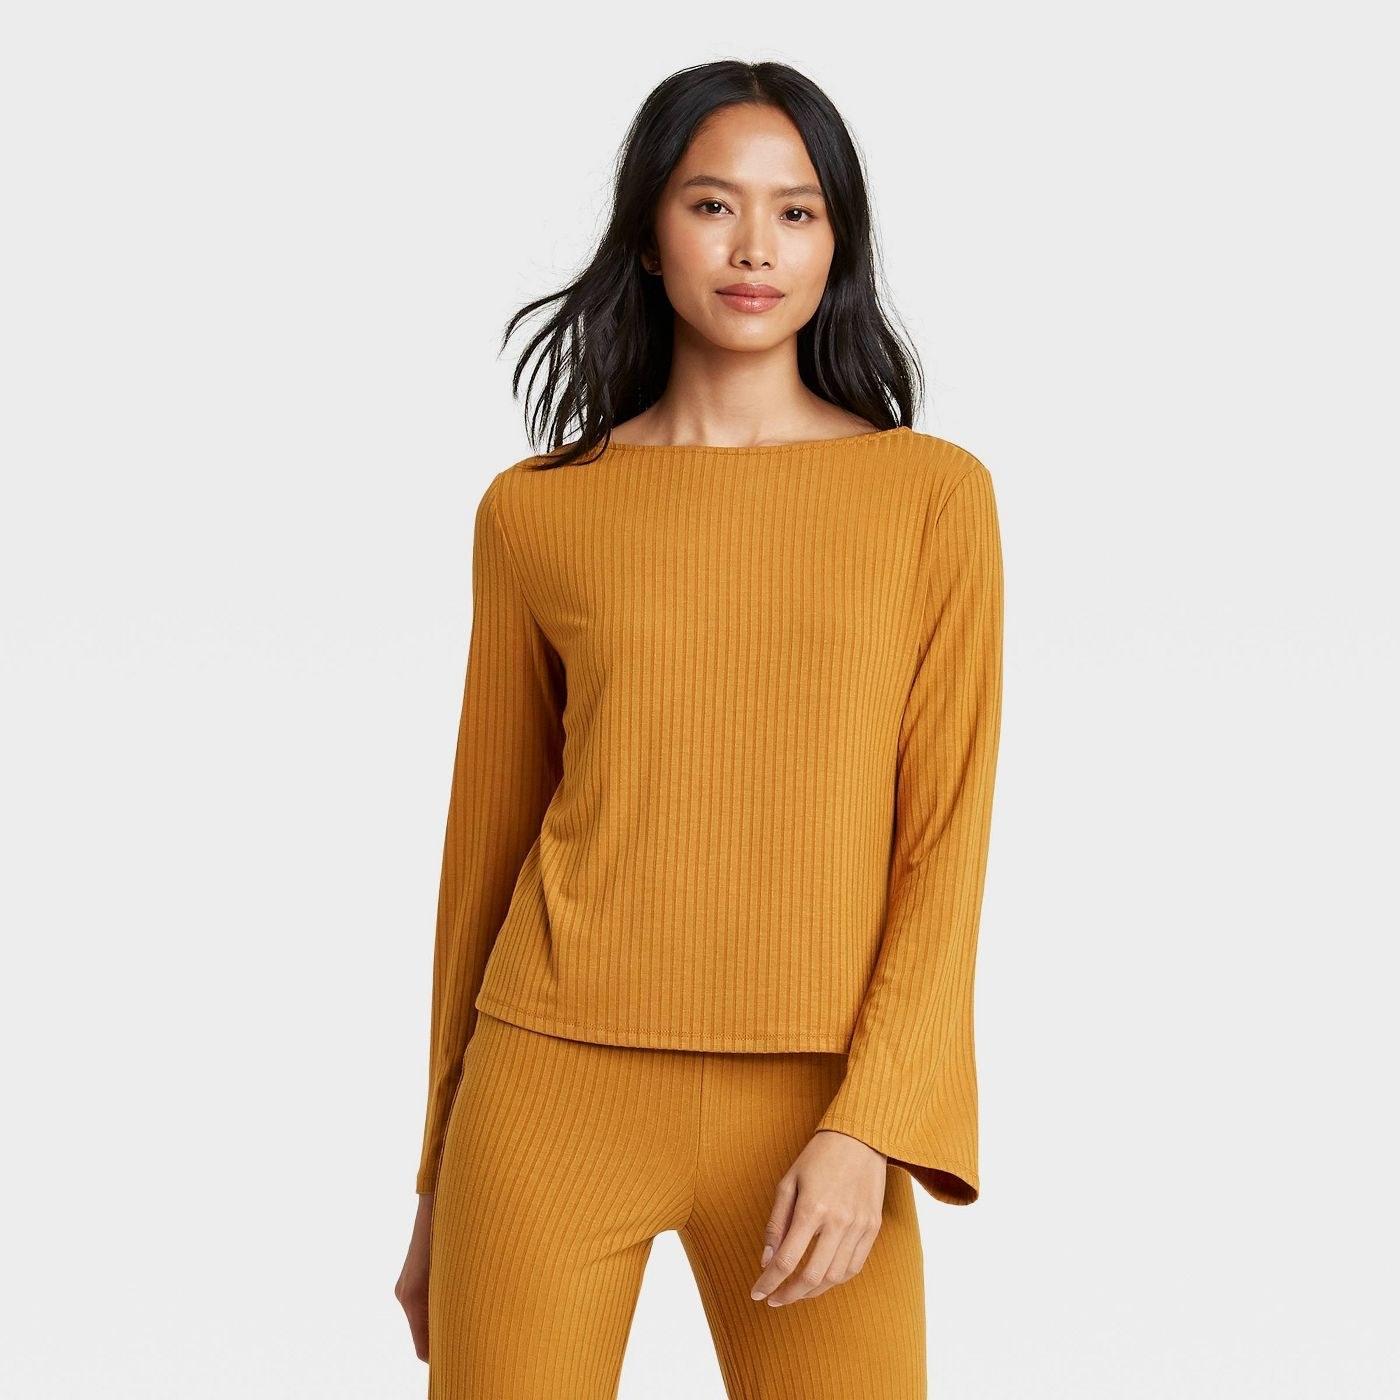 Model in long-sleeve boat-neck T-shirt